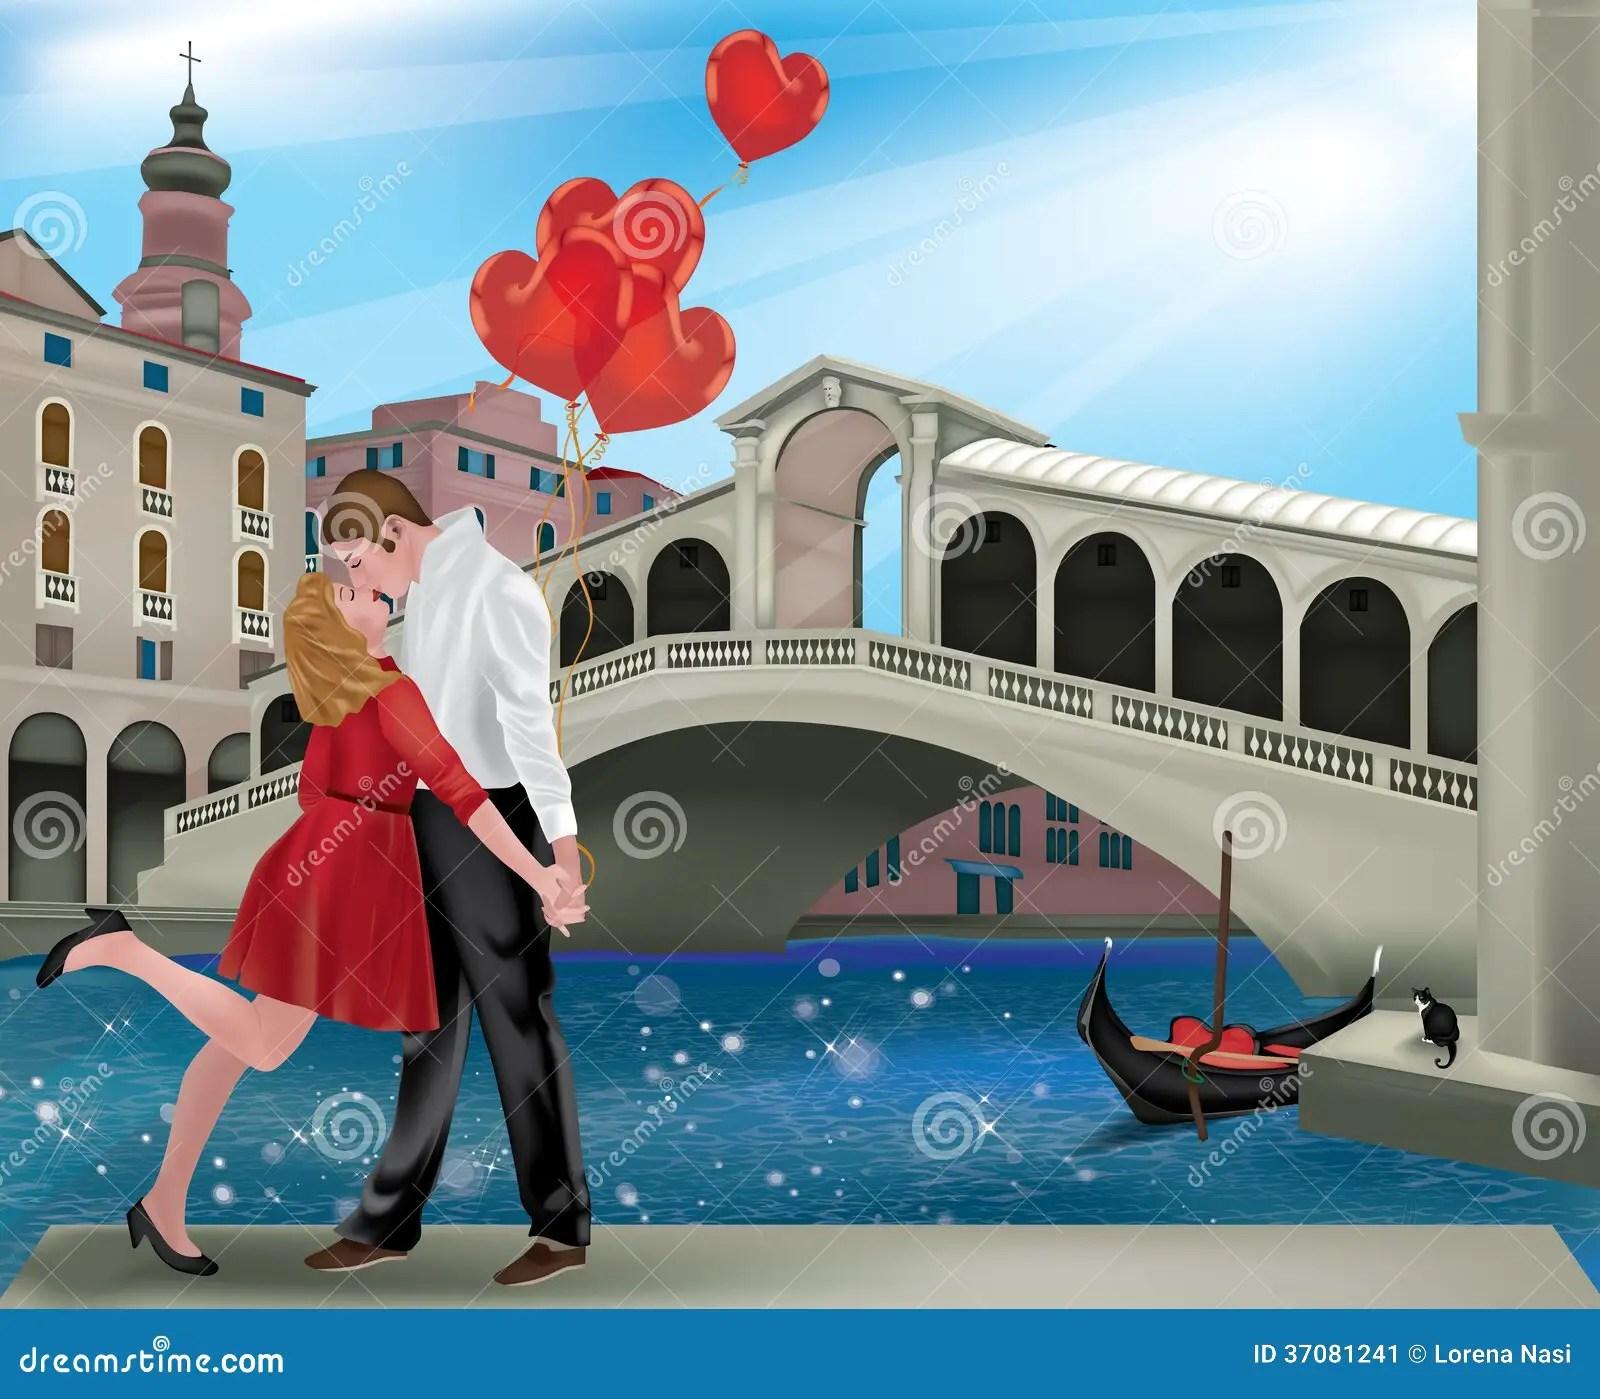 Saint Valentine In Venice Stock Image Image Of Blue